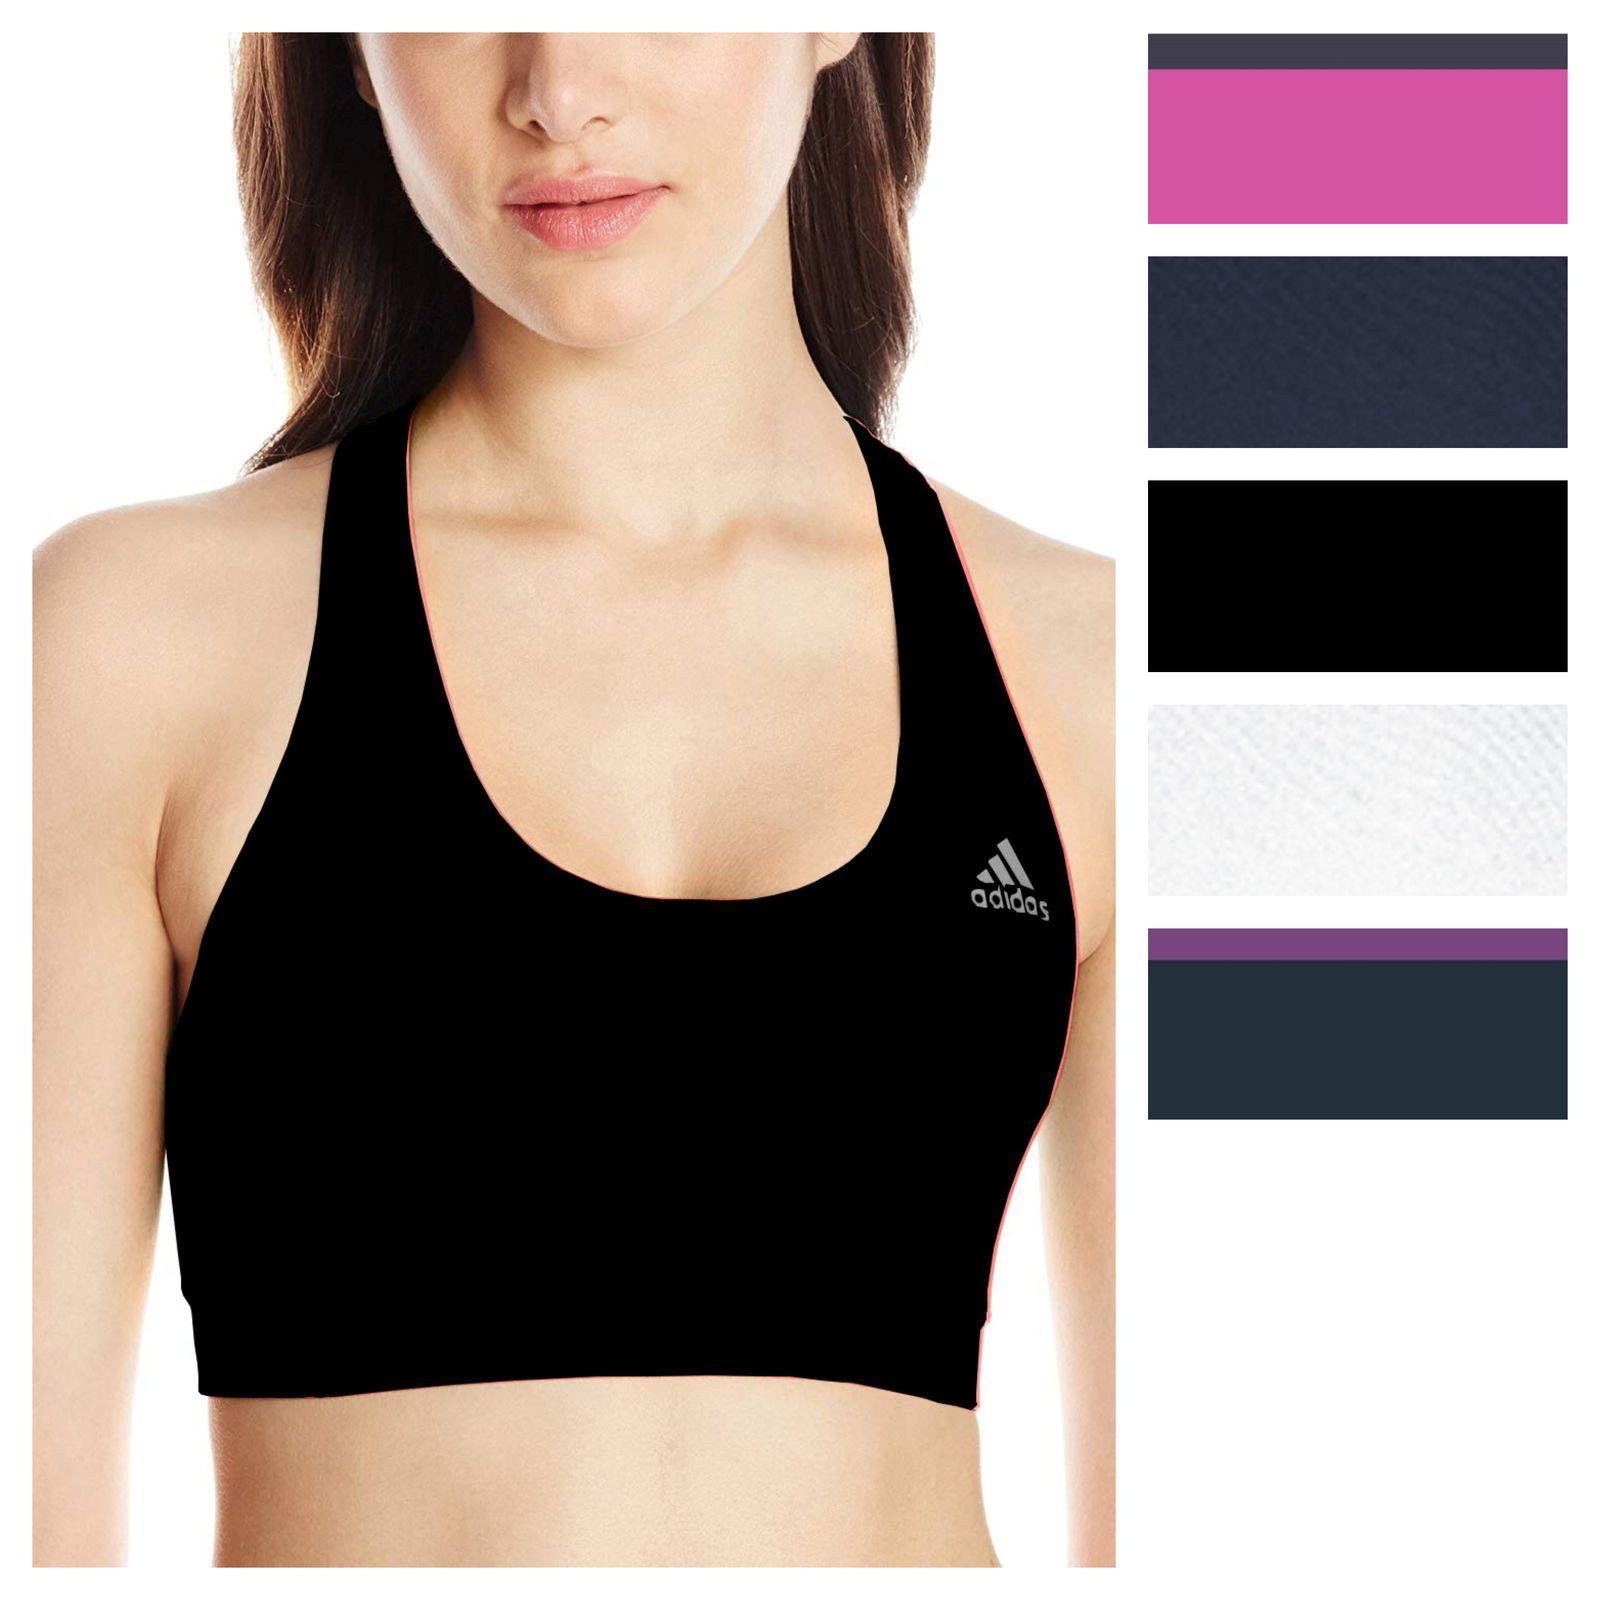 4cbba9da5e85b adidas Women s TechFit Climalite Sports Bra Athletic Training Running  Bralette